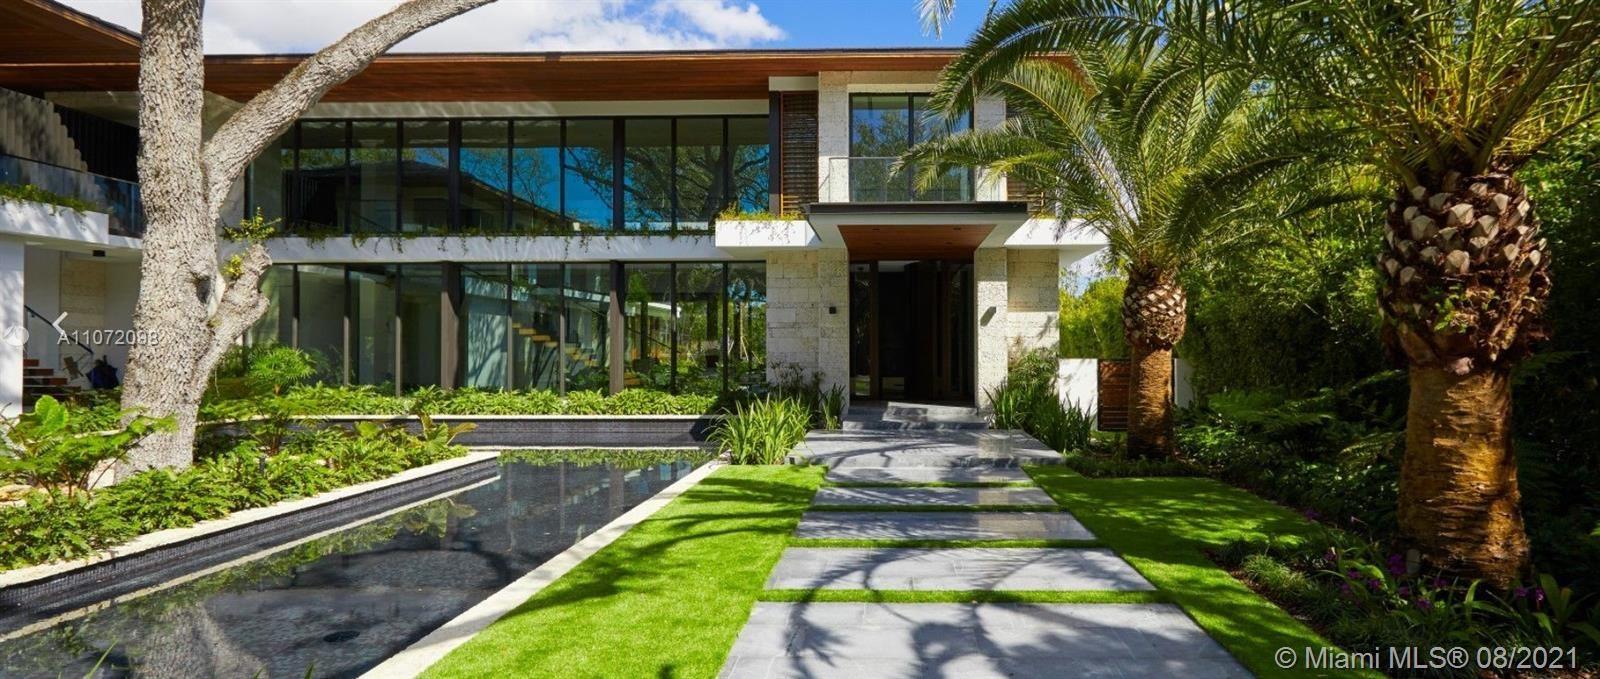 600 HIBISCUS LANE, Miami, FL 33137 - #: A11072098